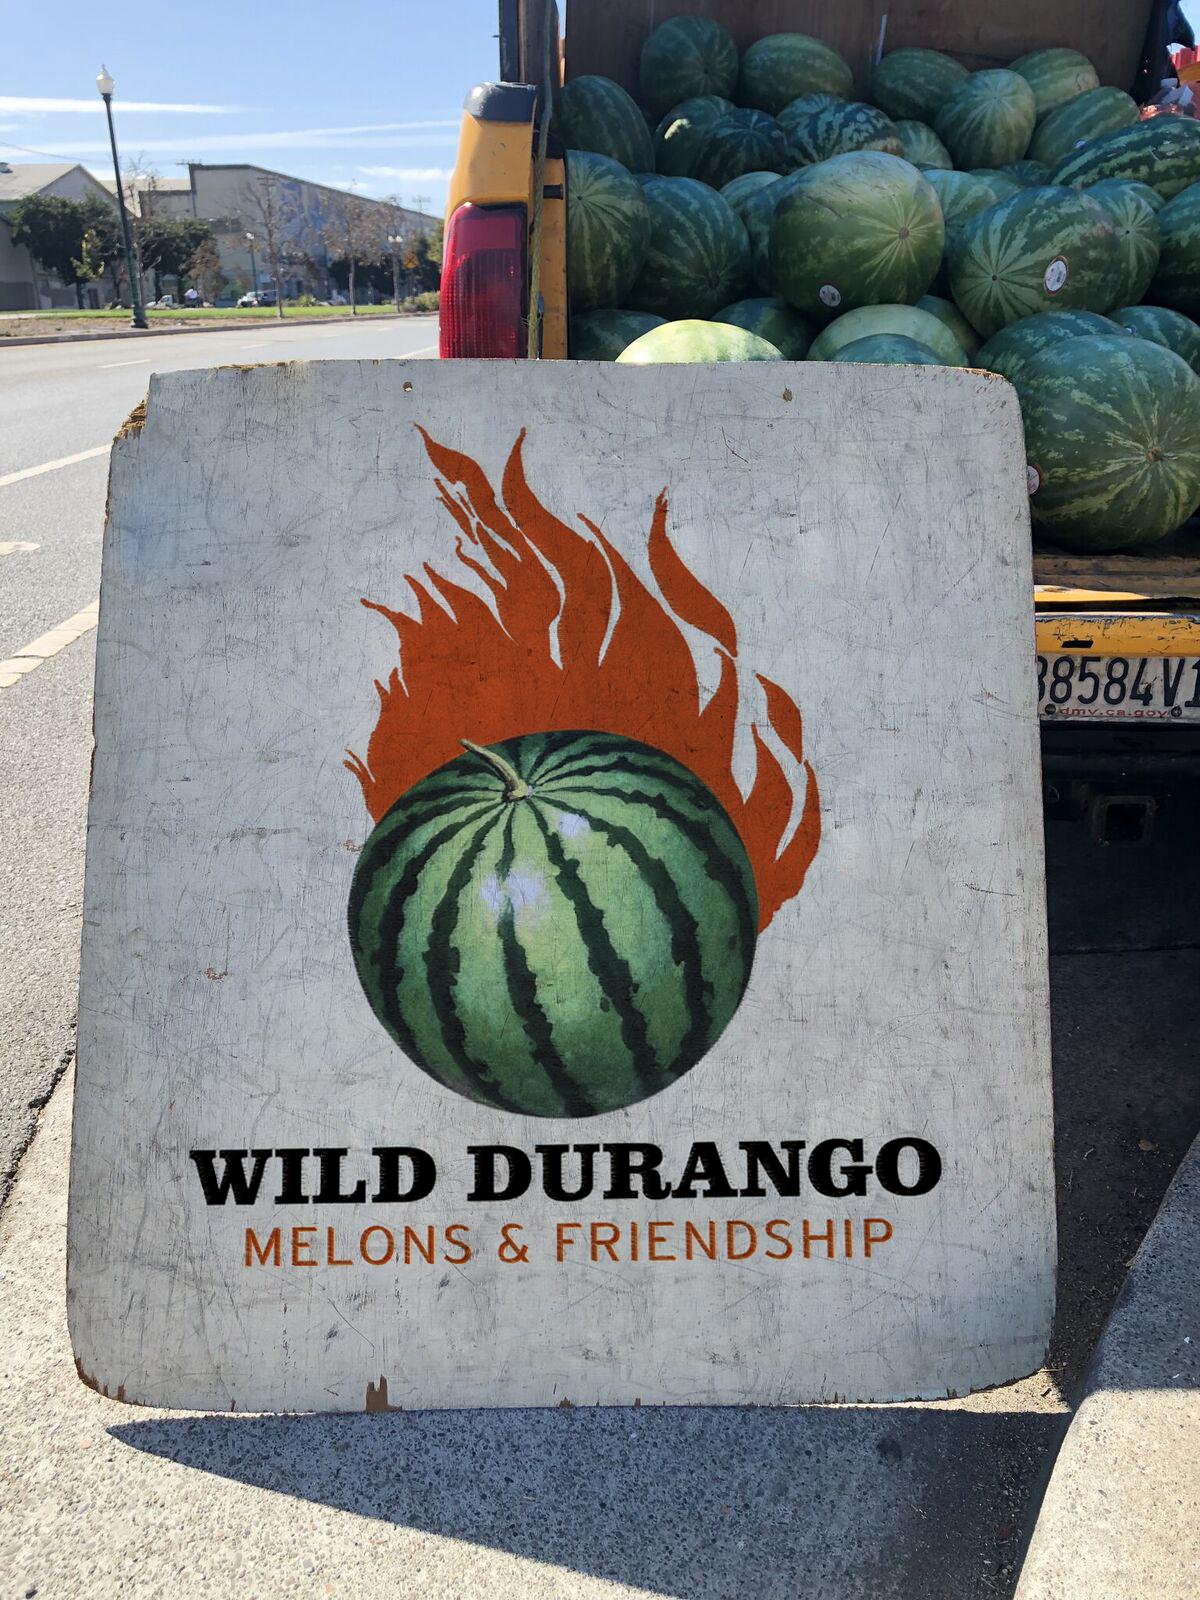 DurangoFiles.jpg